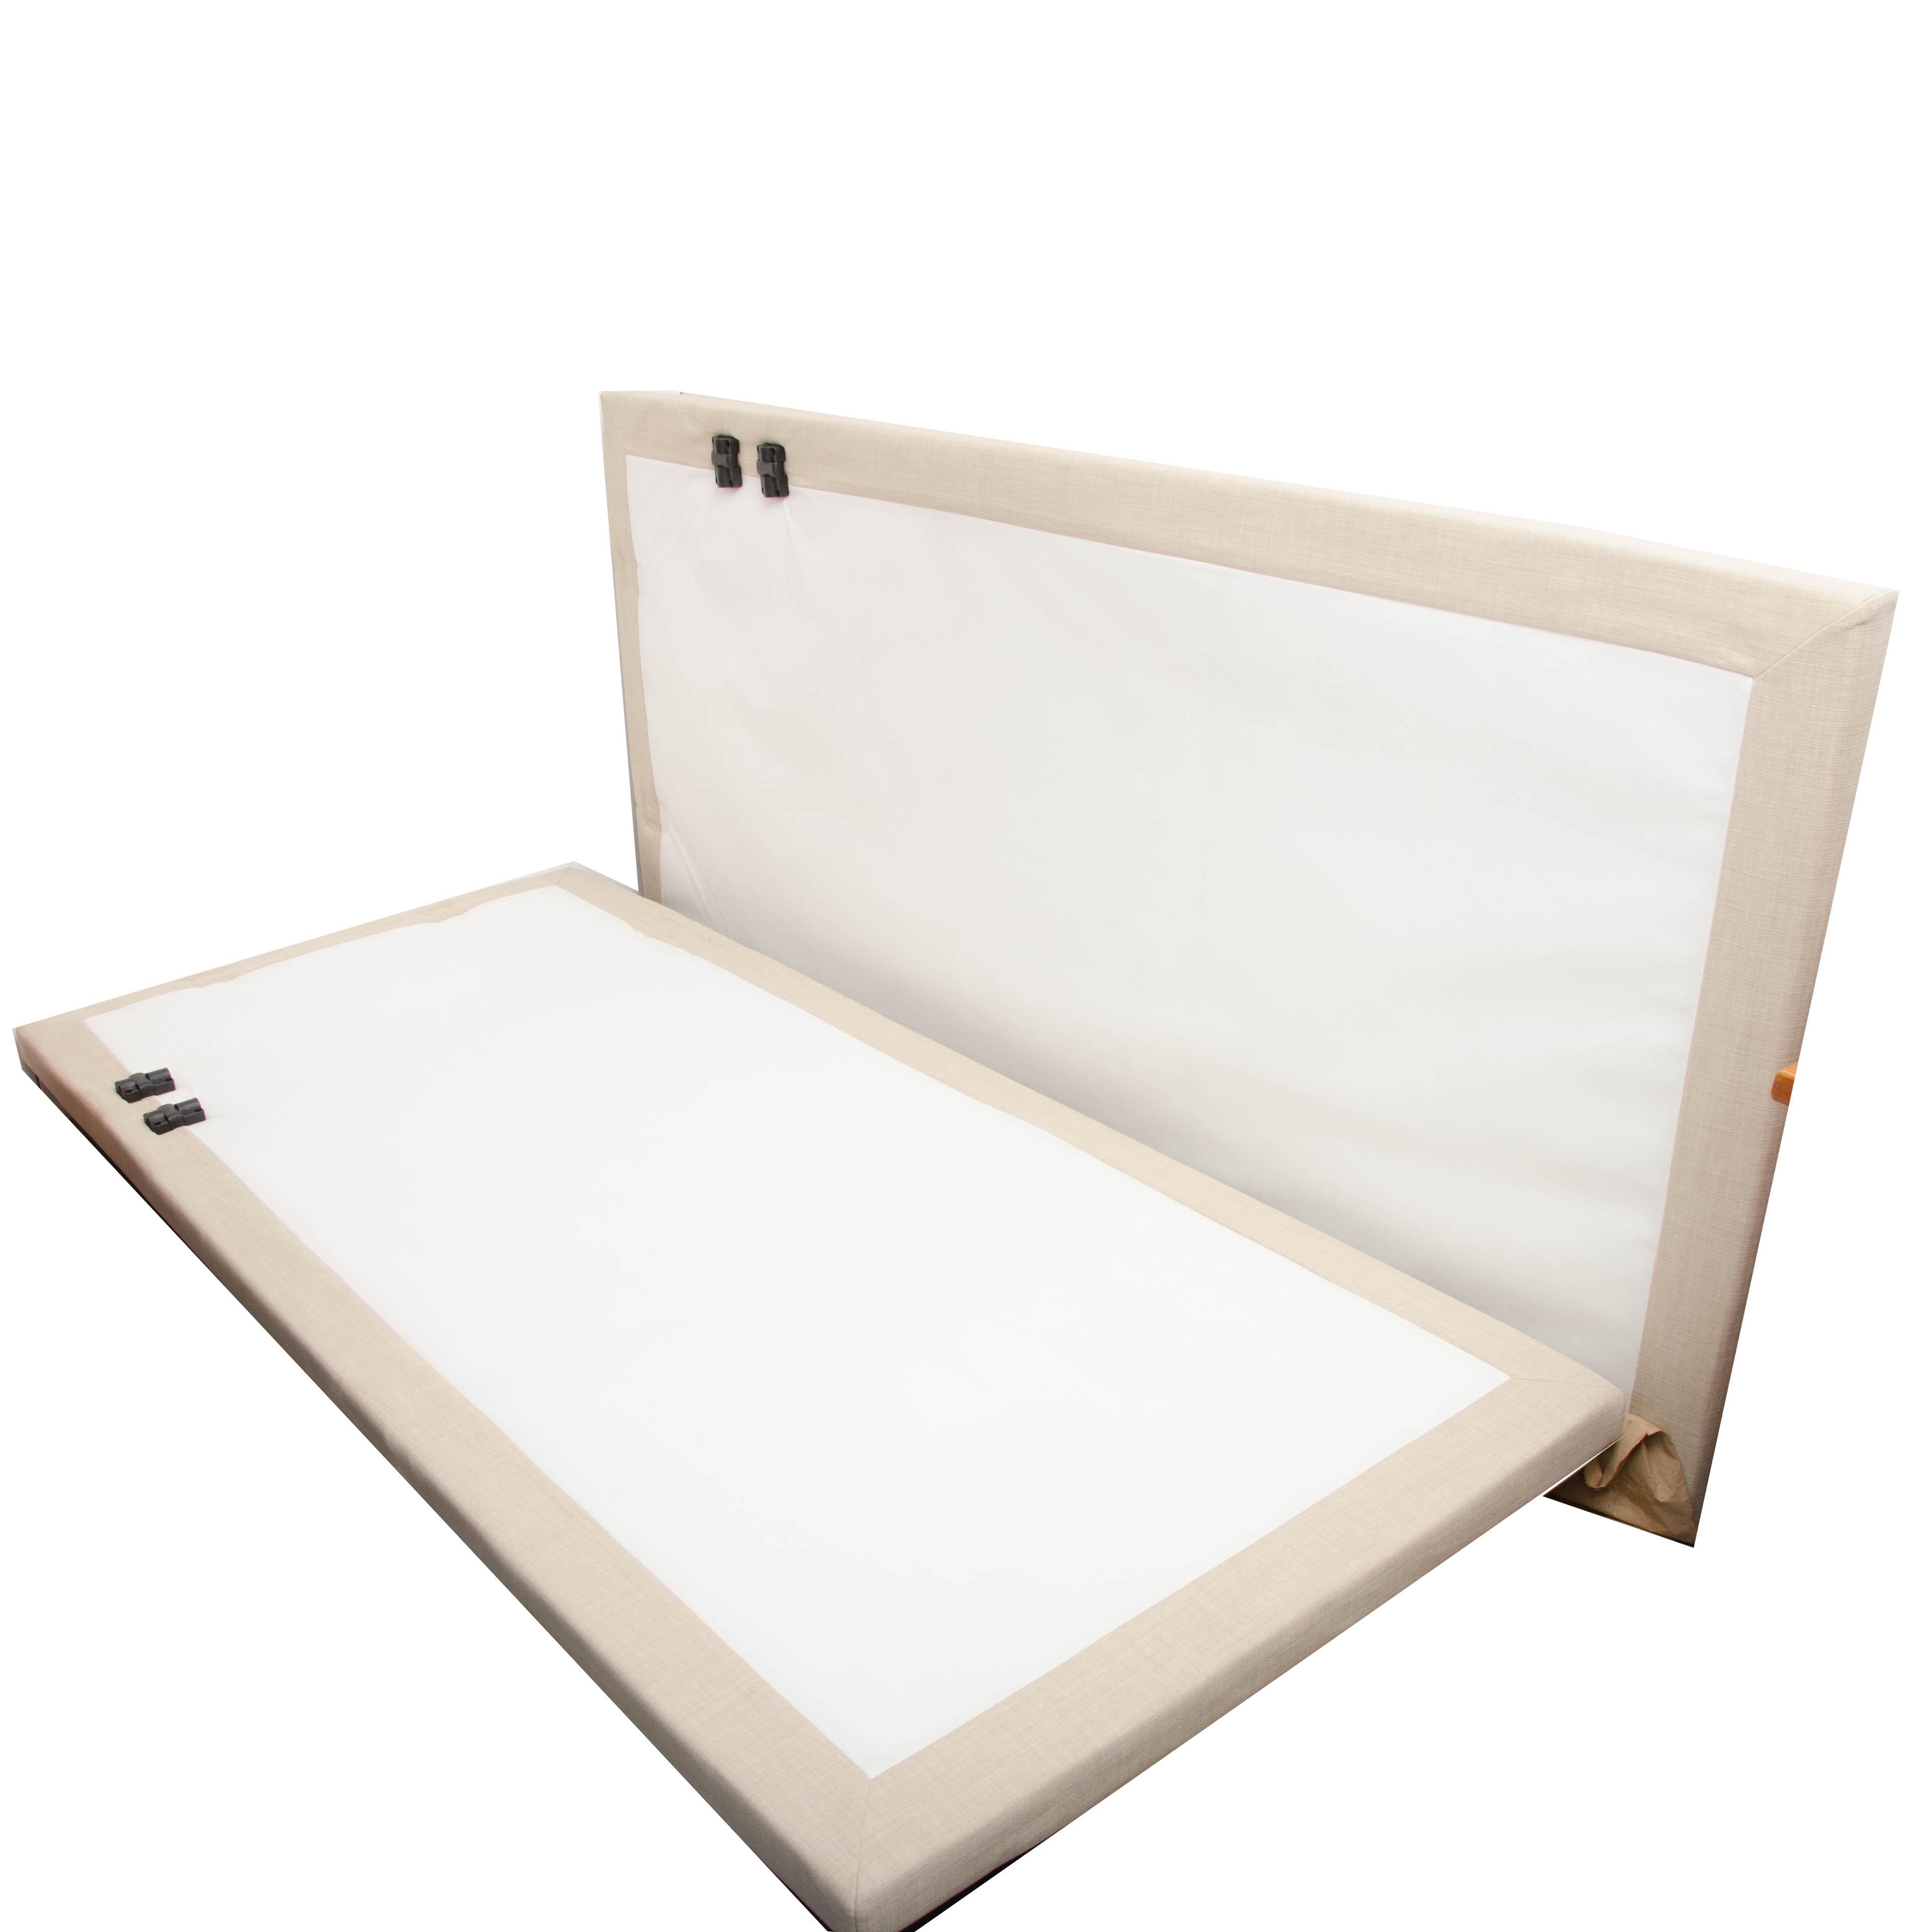 King-Size Power Adjustable Bed Base